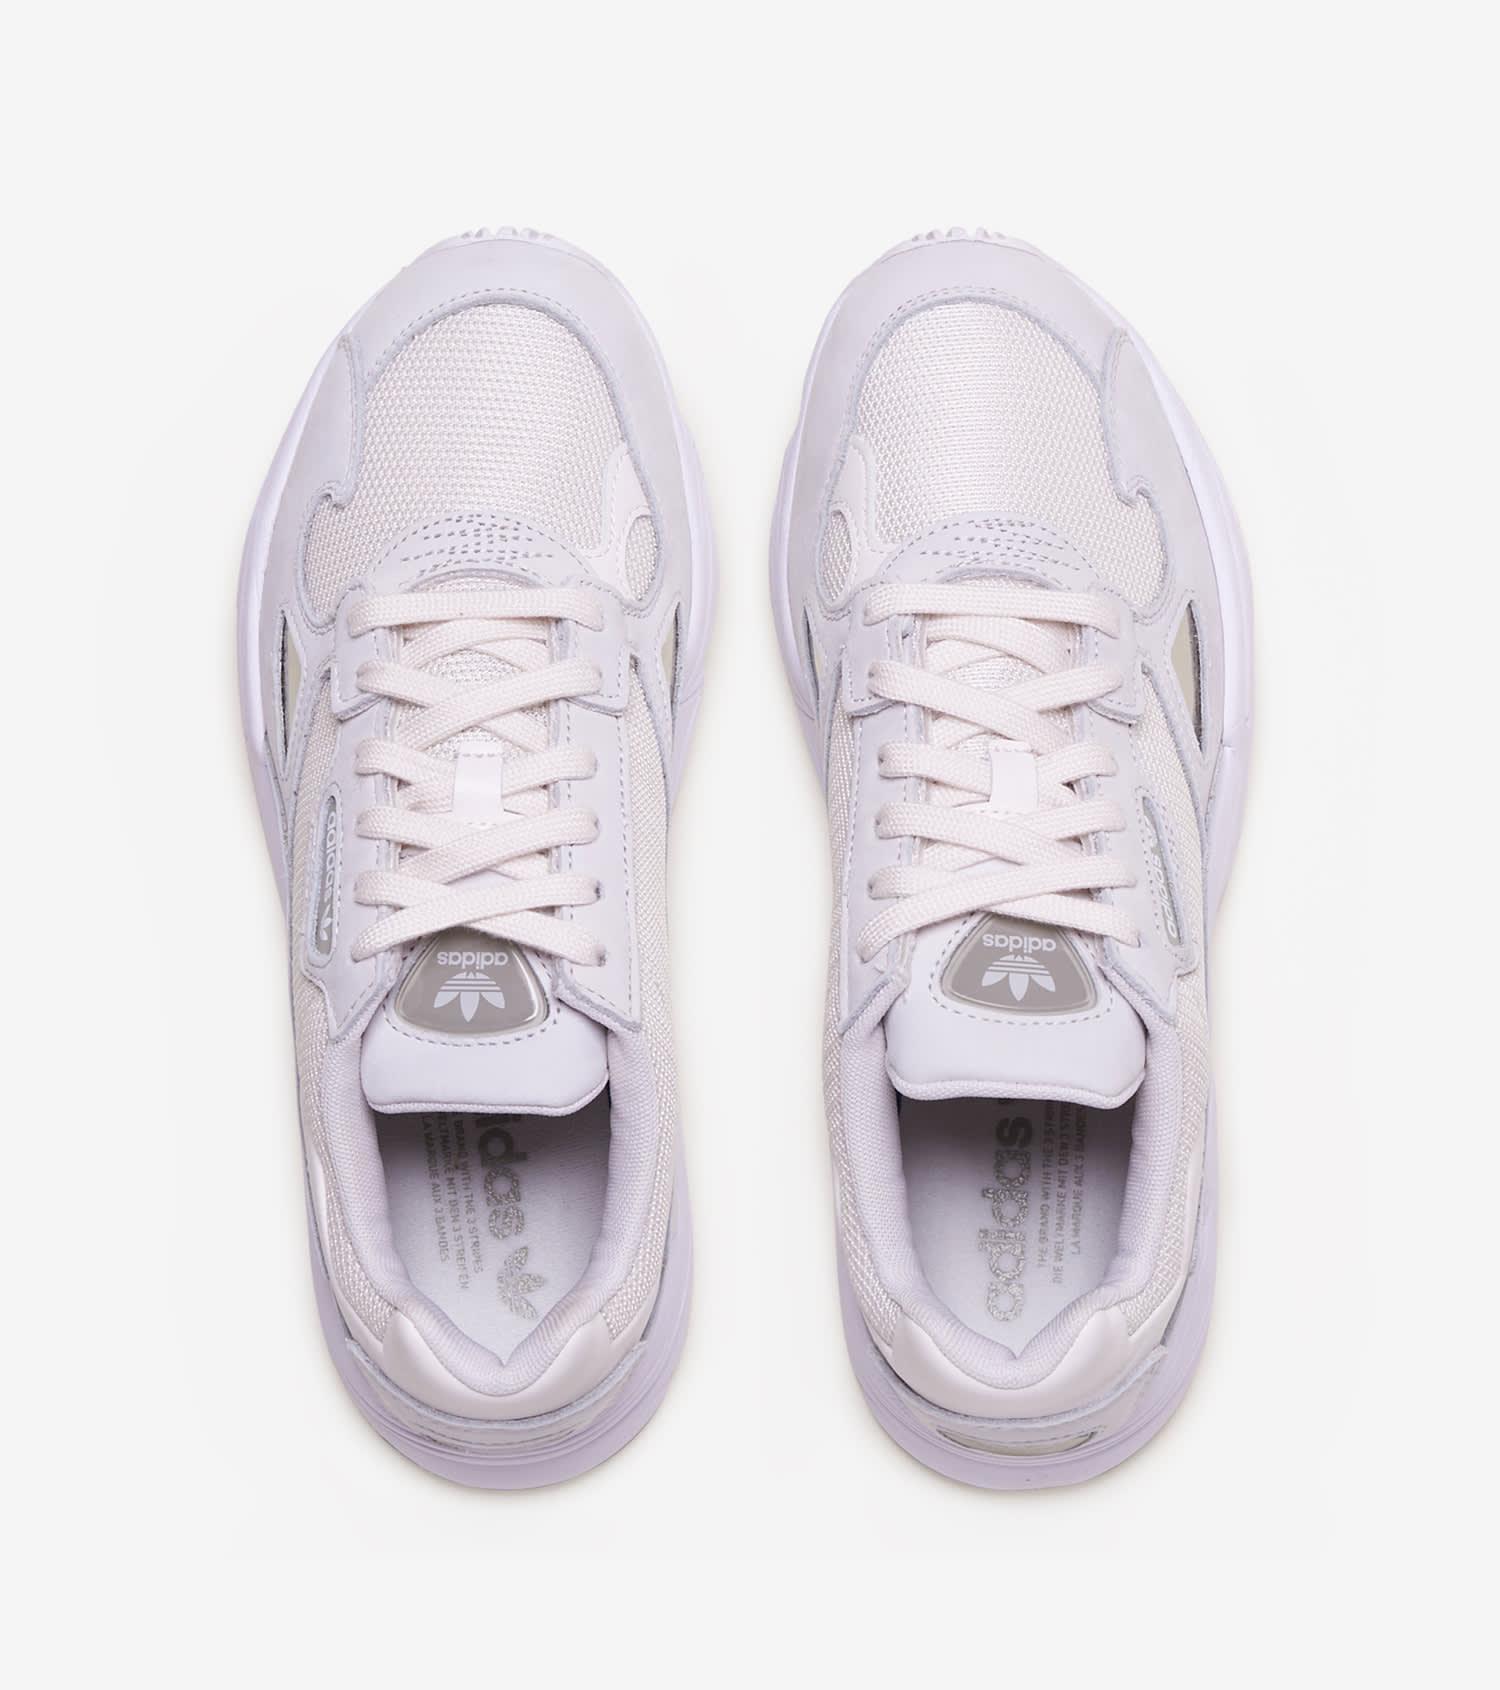 Womens Adidas Originals Falcon Kylie Shoe In Cloud White Grey